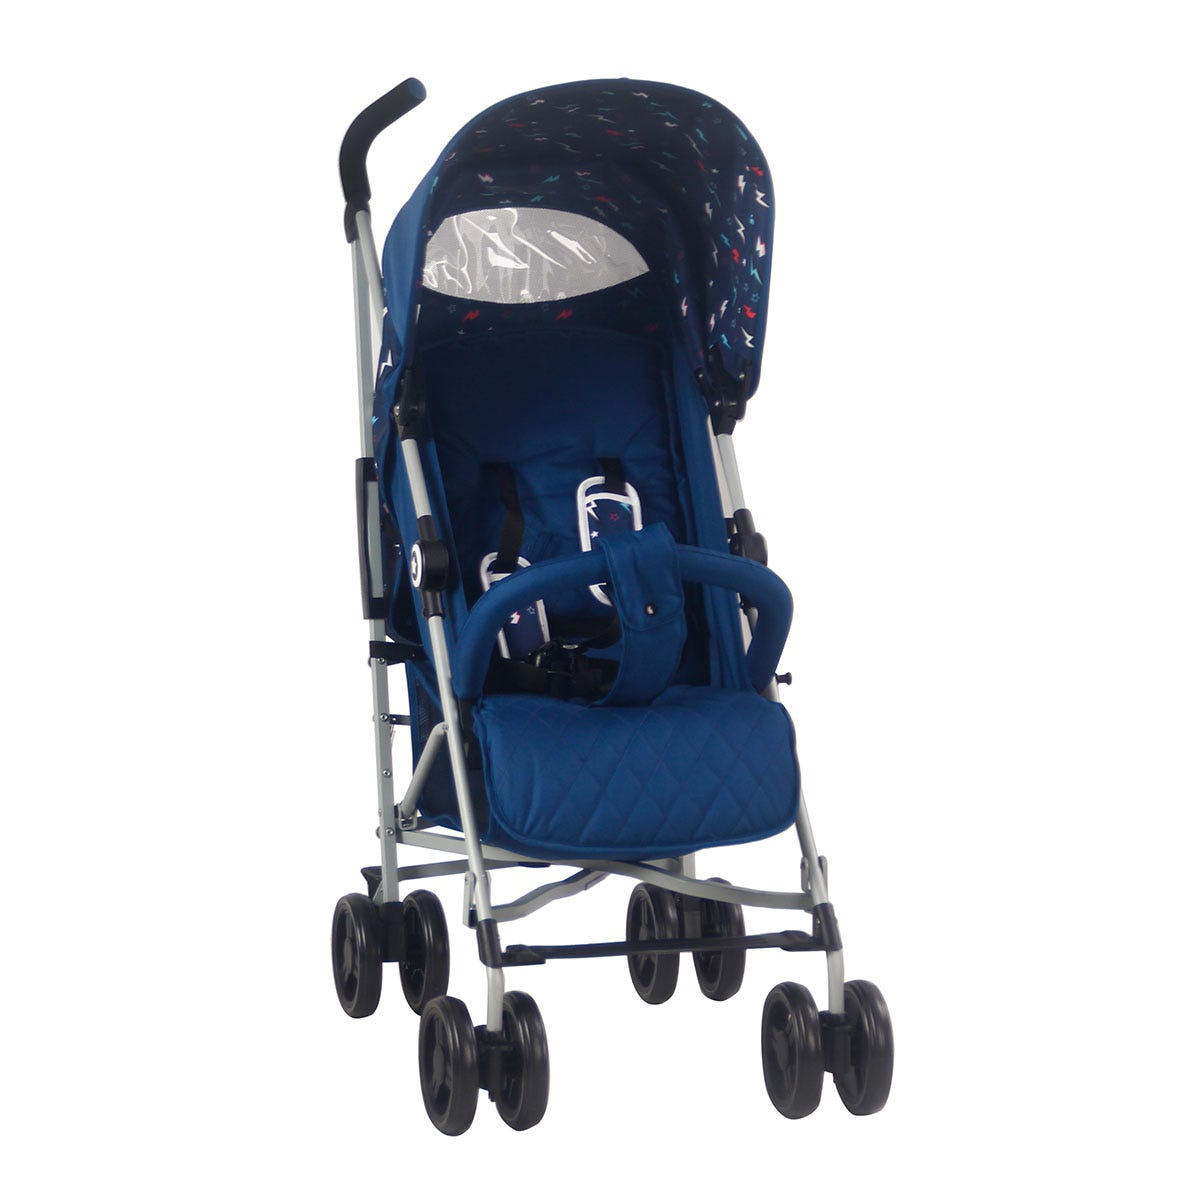 My Babiie MB02 Stroller - Blue Flash